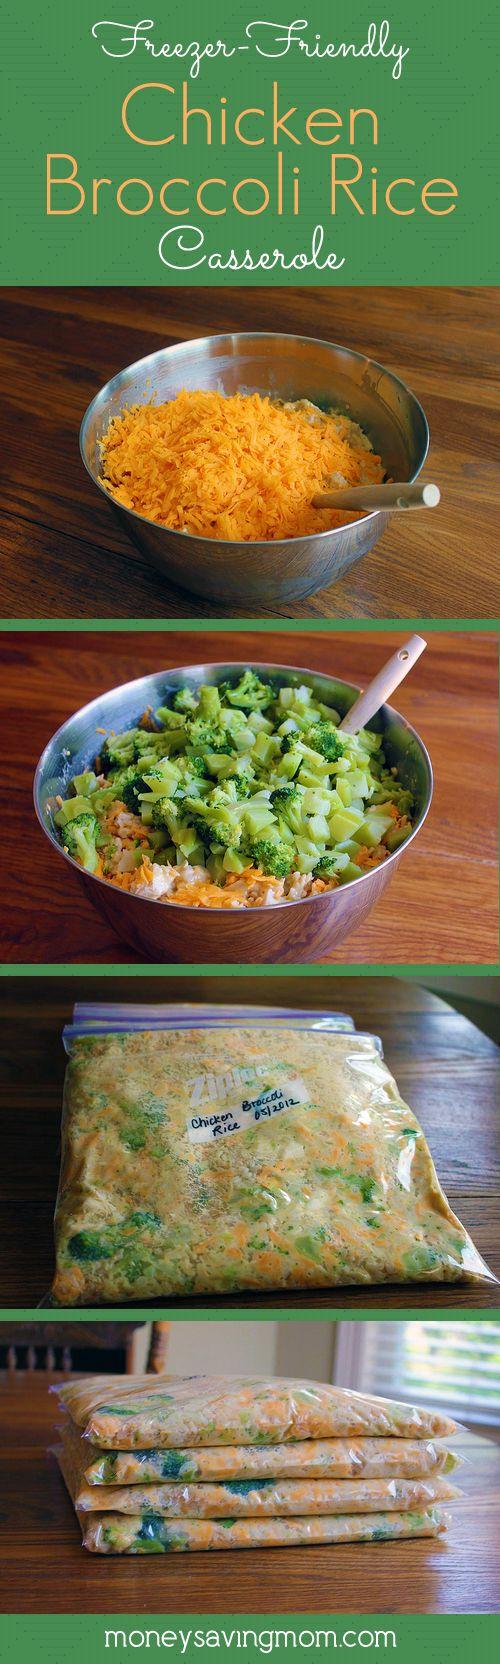 Freezer Friendly Chicken Broccoli Rice Casserole...100's of the BEST Freezer Meals!